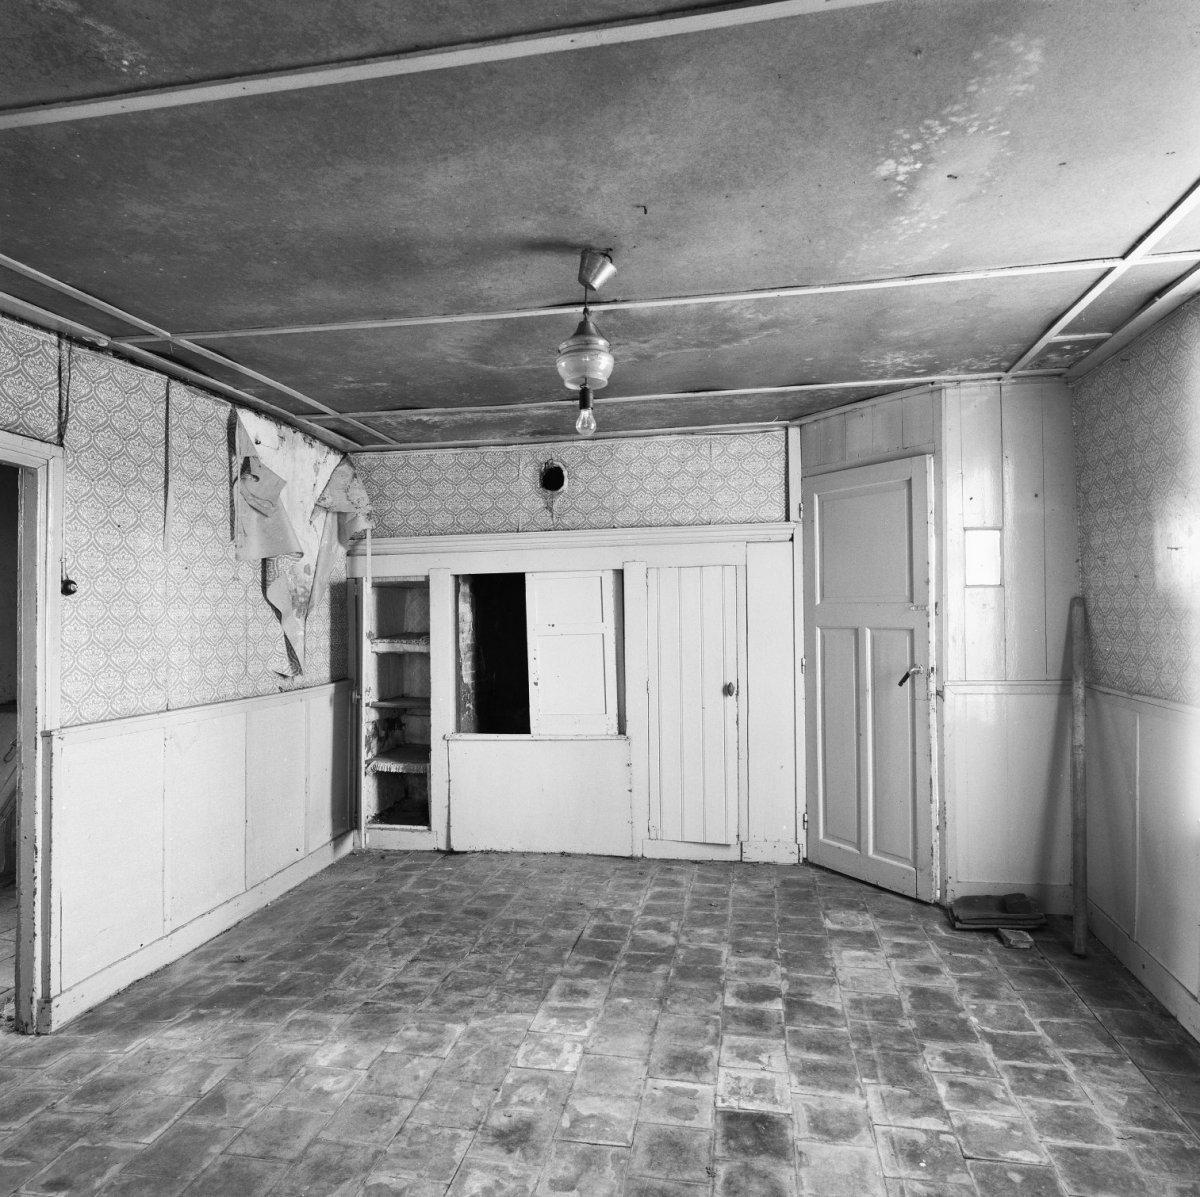 File interieur woonkamer overzicht spekkast en grijze for Interieur woonkamer